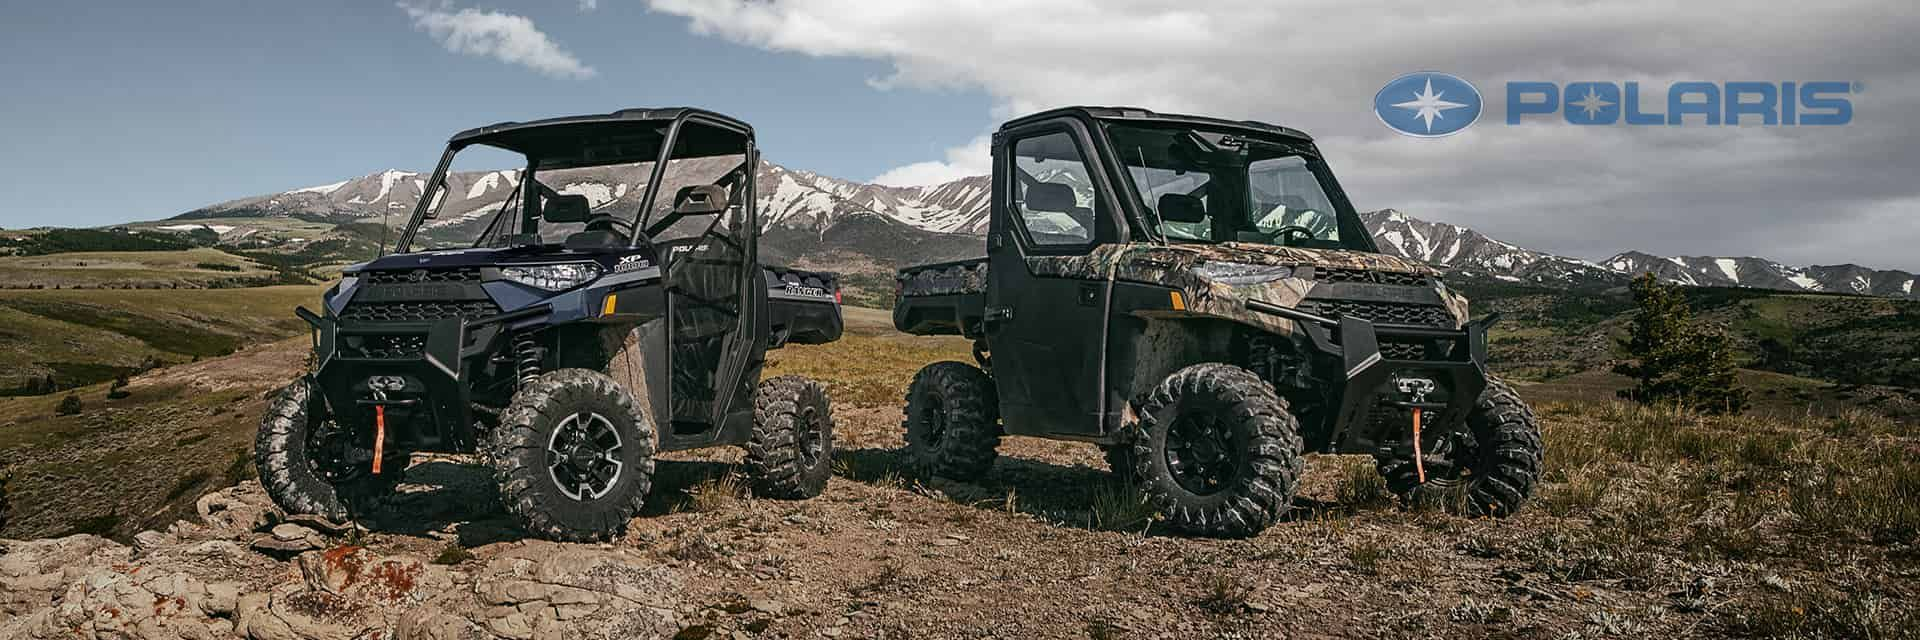 Polaris is available at Sharp's Motorsports | Amarillo, TX